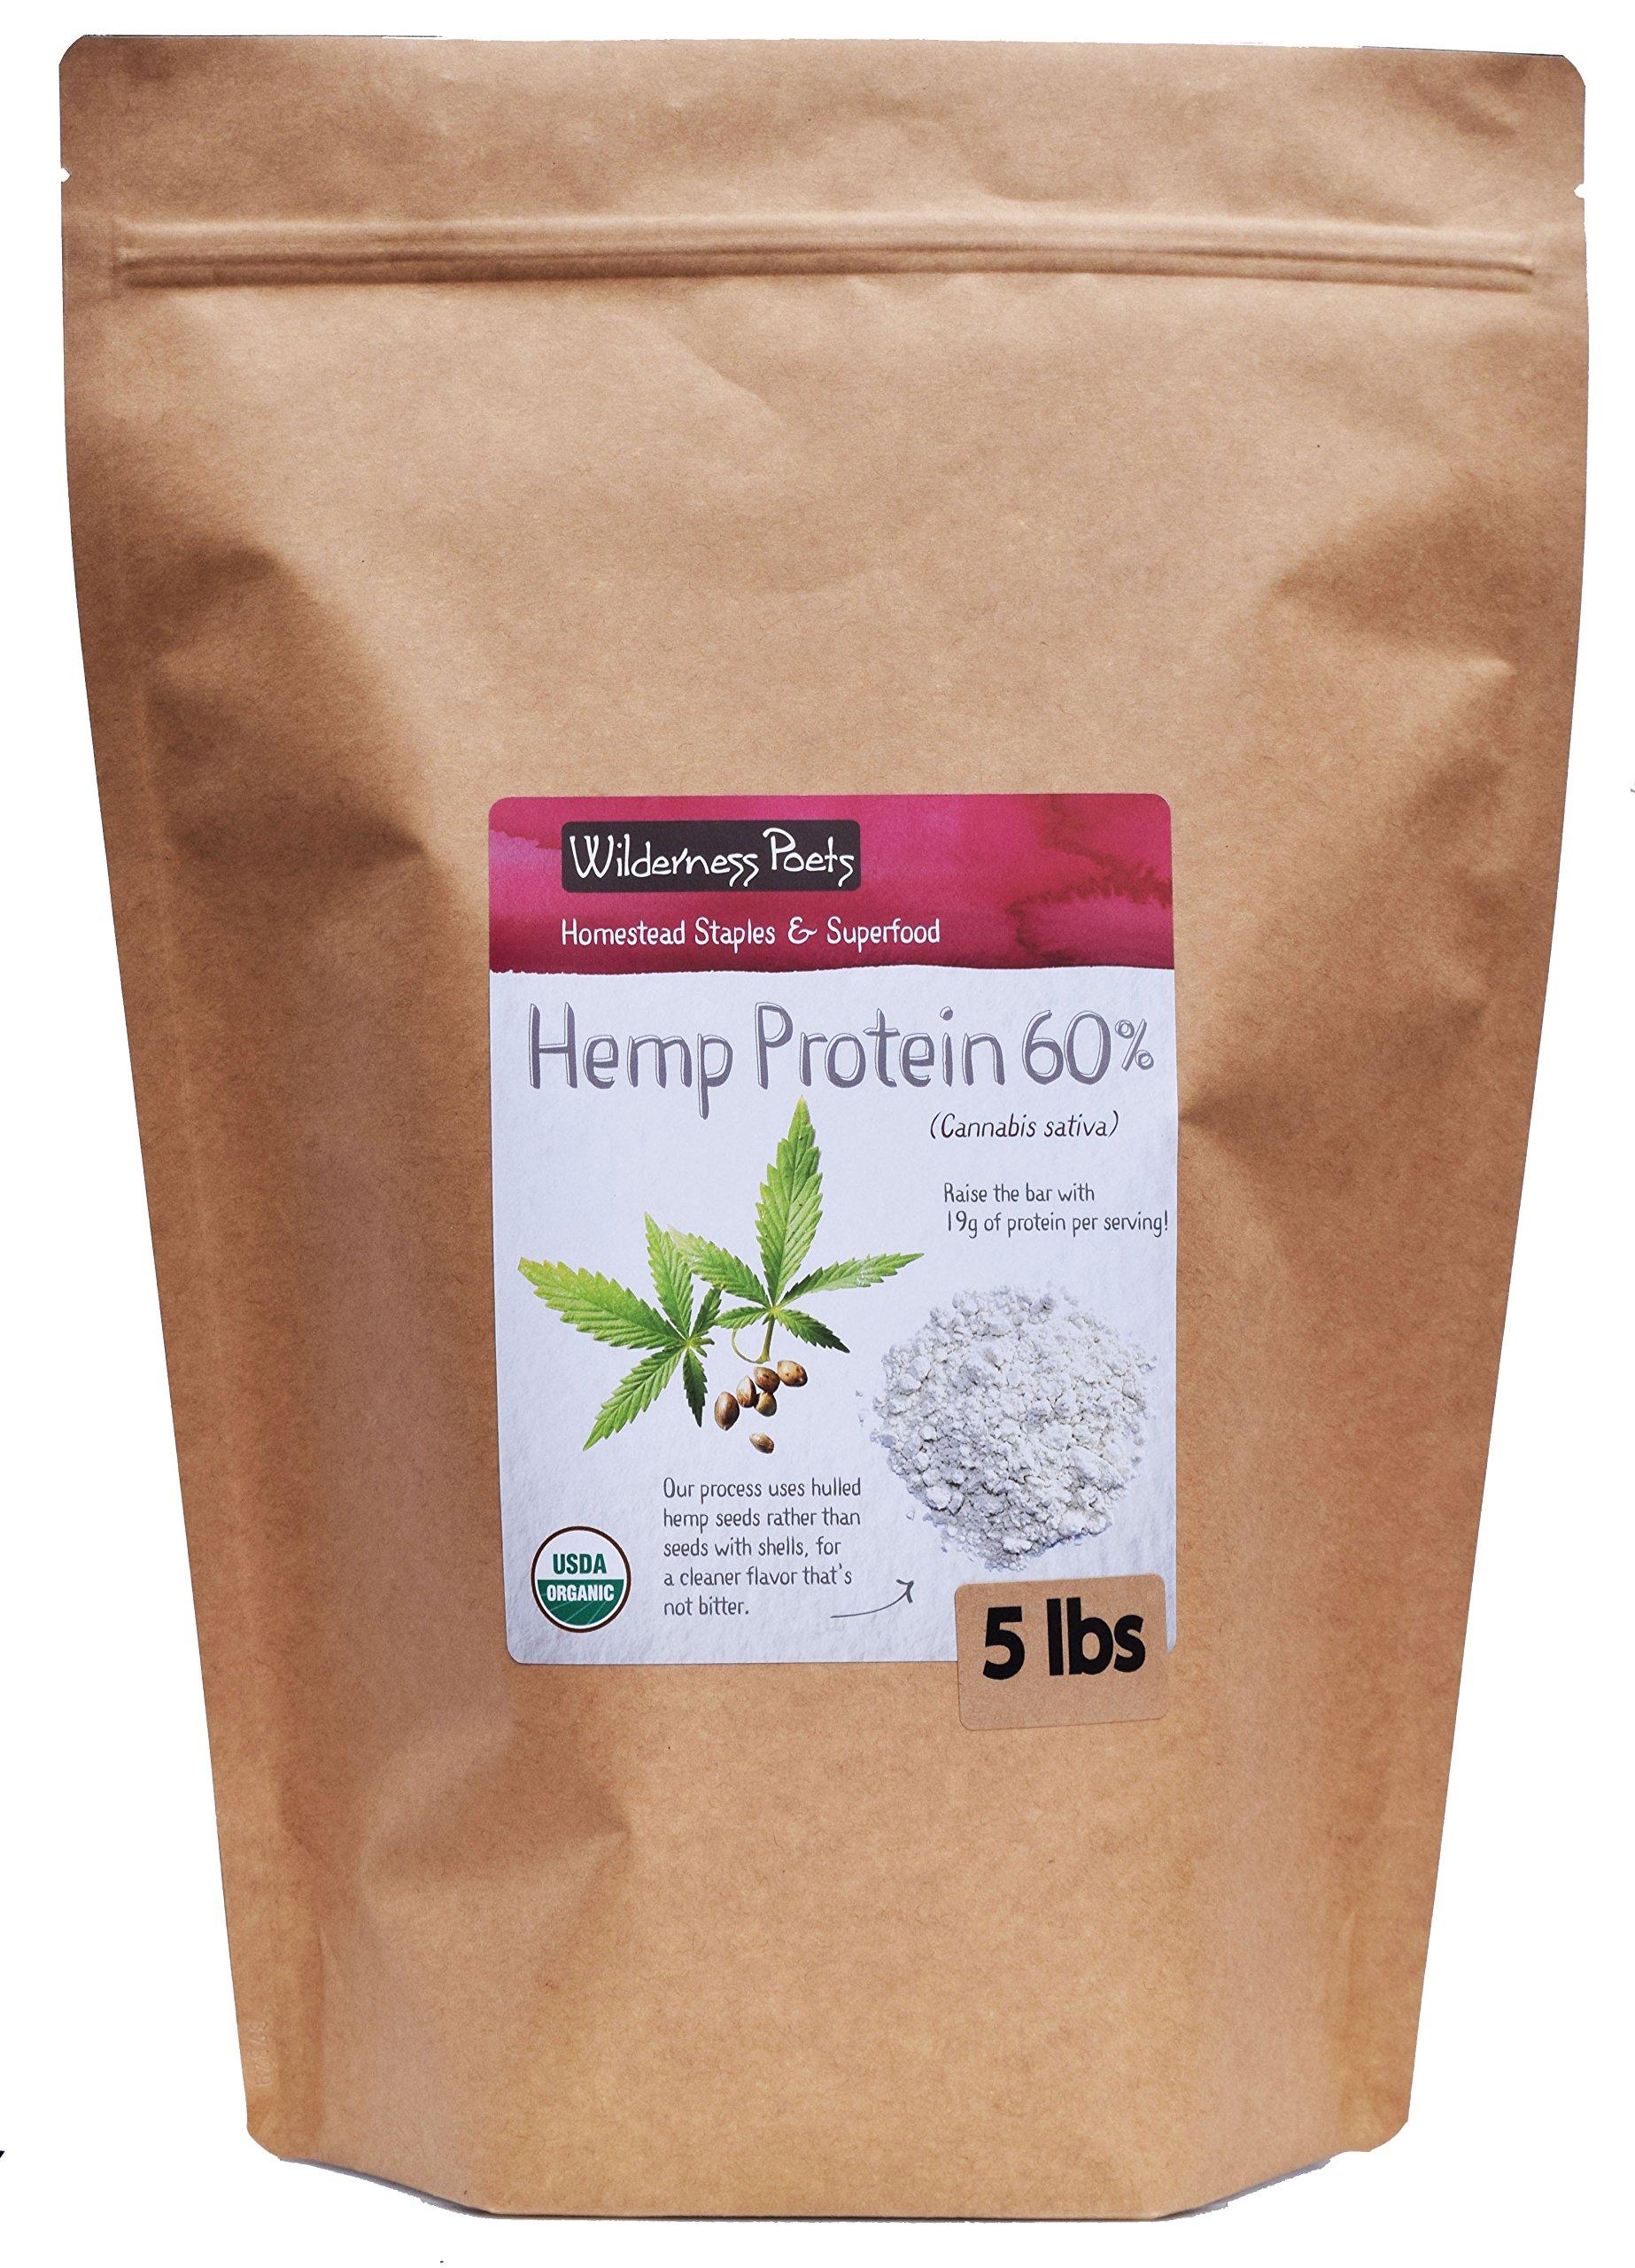 Wilderness Poets, Cold Pressed Organic Hemp Protein Powder, 19 G (80 Ounce - 5 Pound) by Wilderness Poets